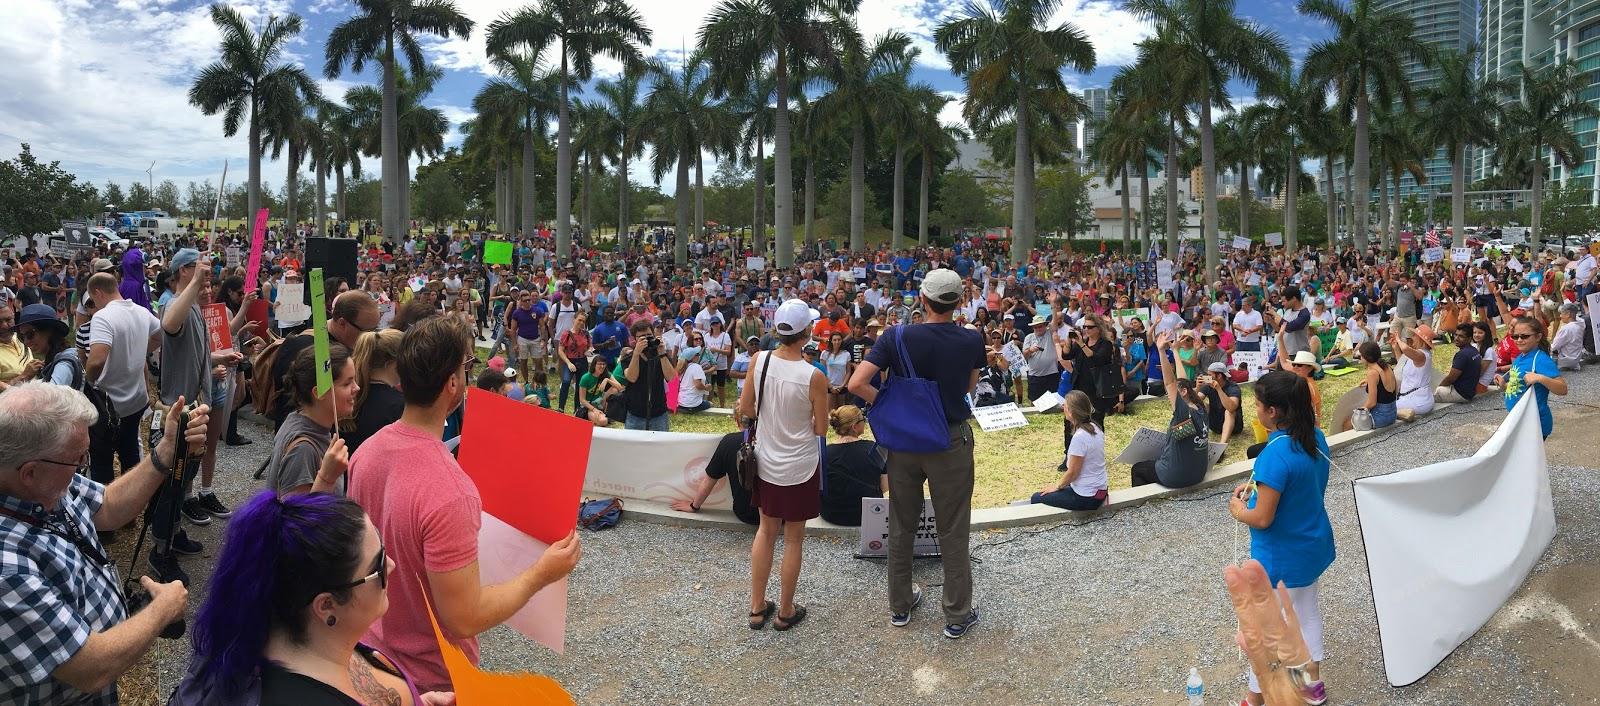 Miami, March For Science, April 22, 2017